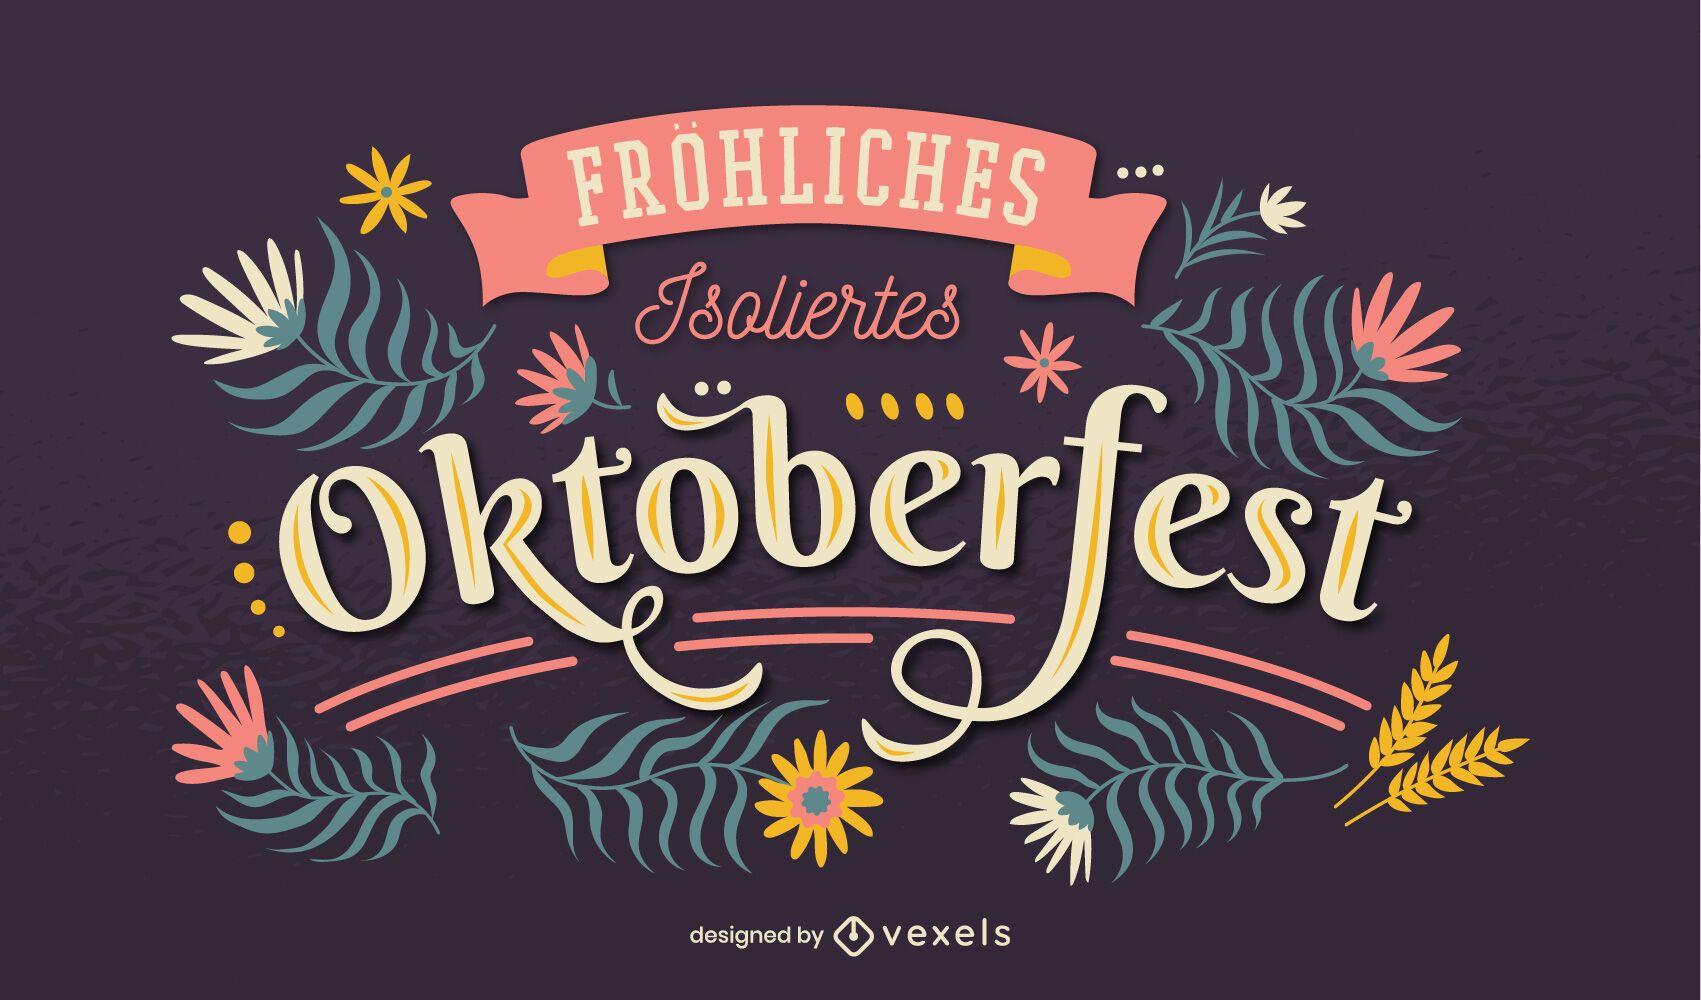 Letras clássicas da oktoberfest